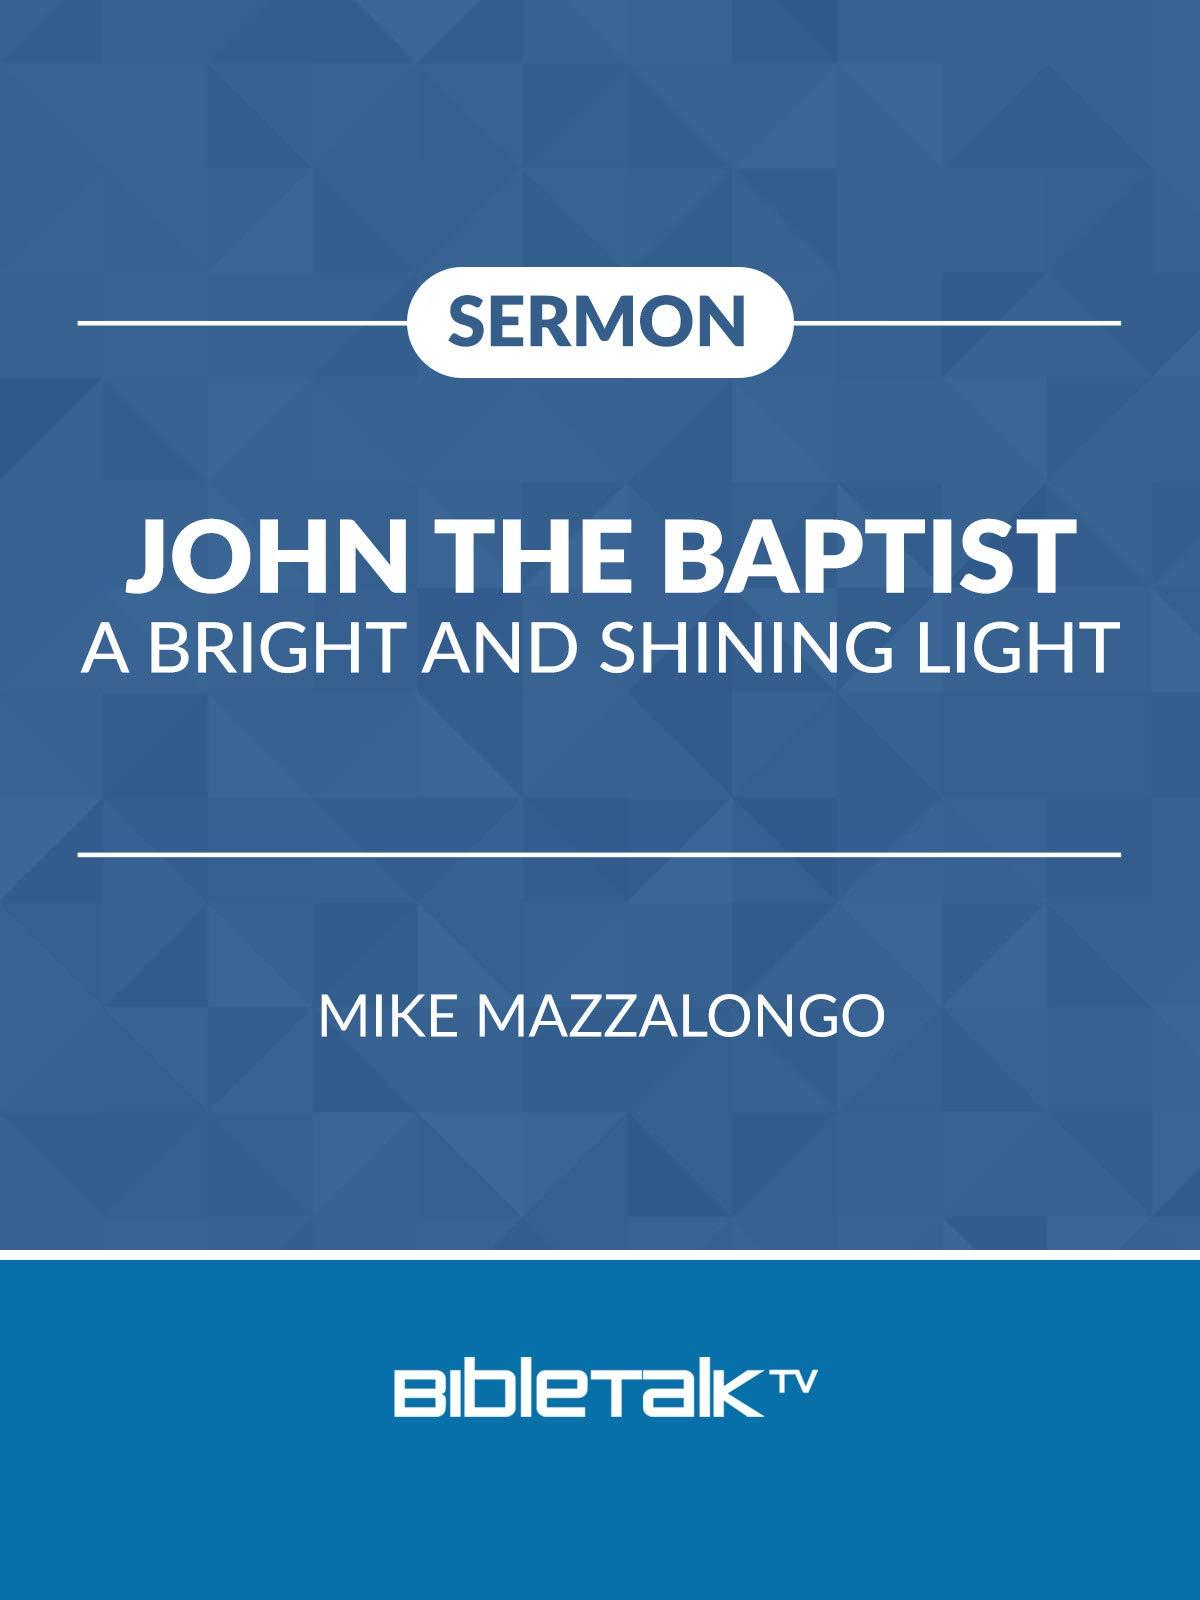 John the Baptist: A Bright and Shining Light